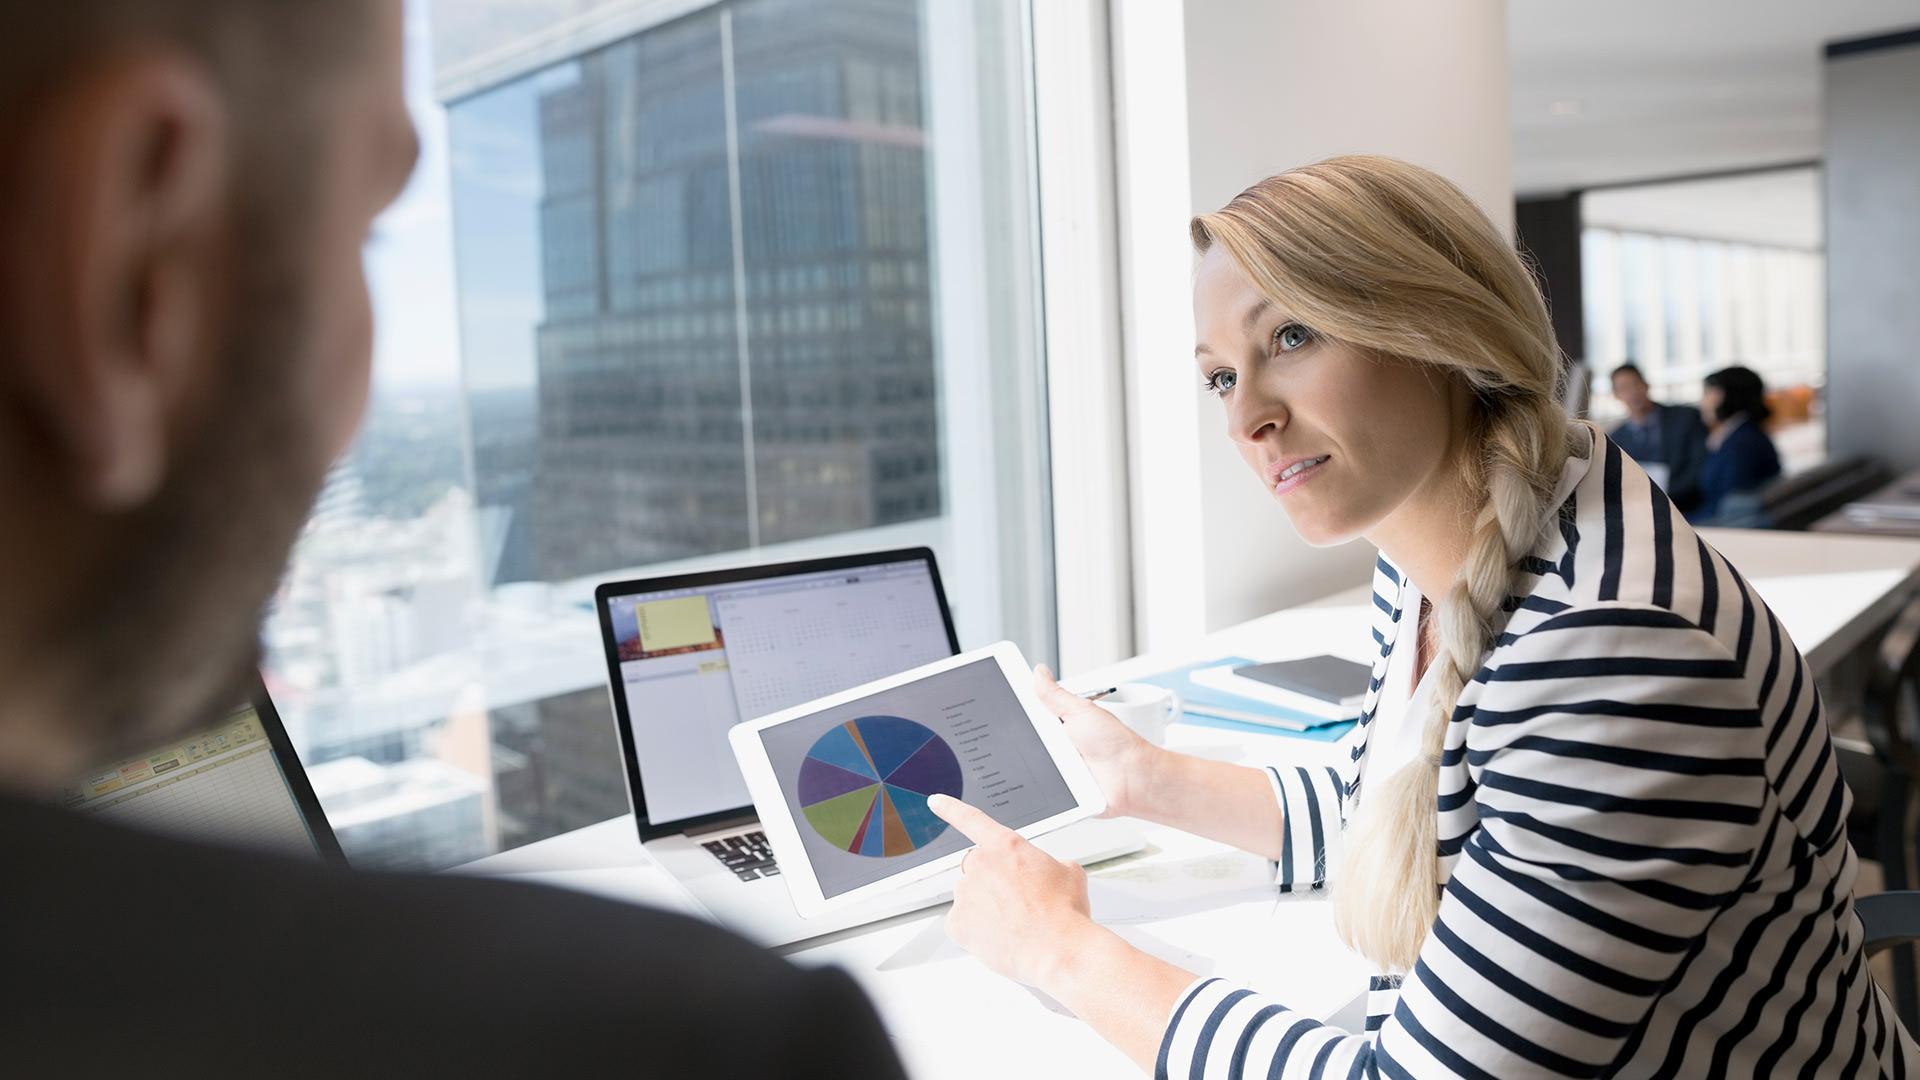 Using pipeline management software on desktop computer